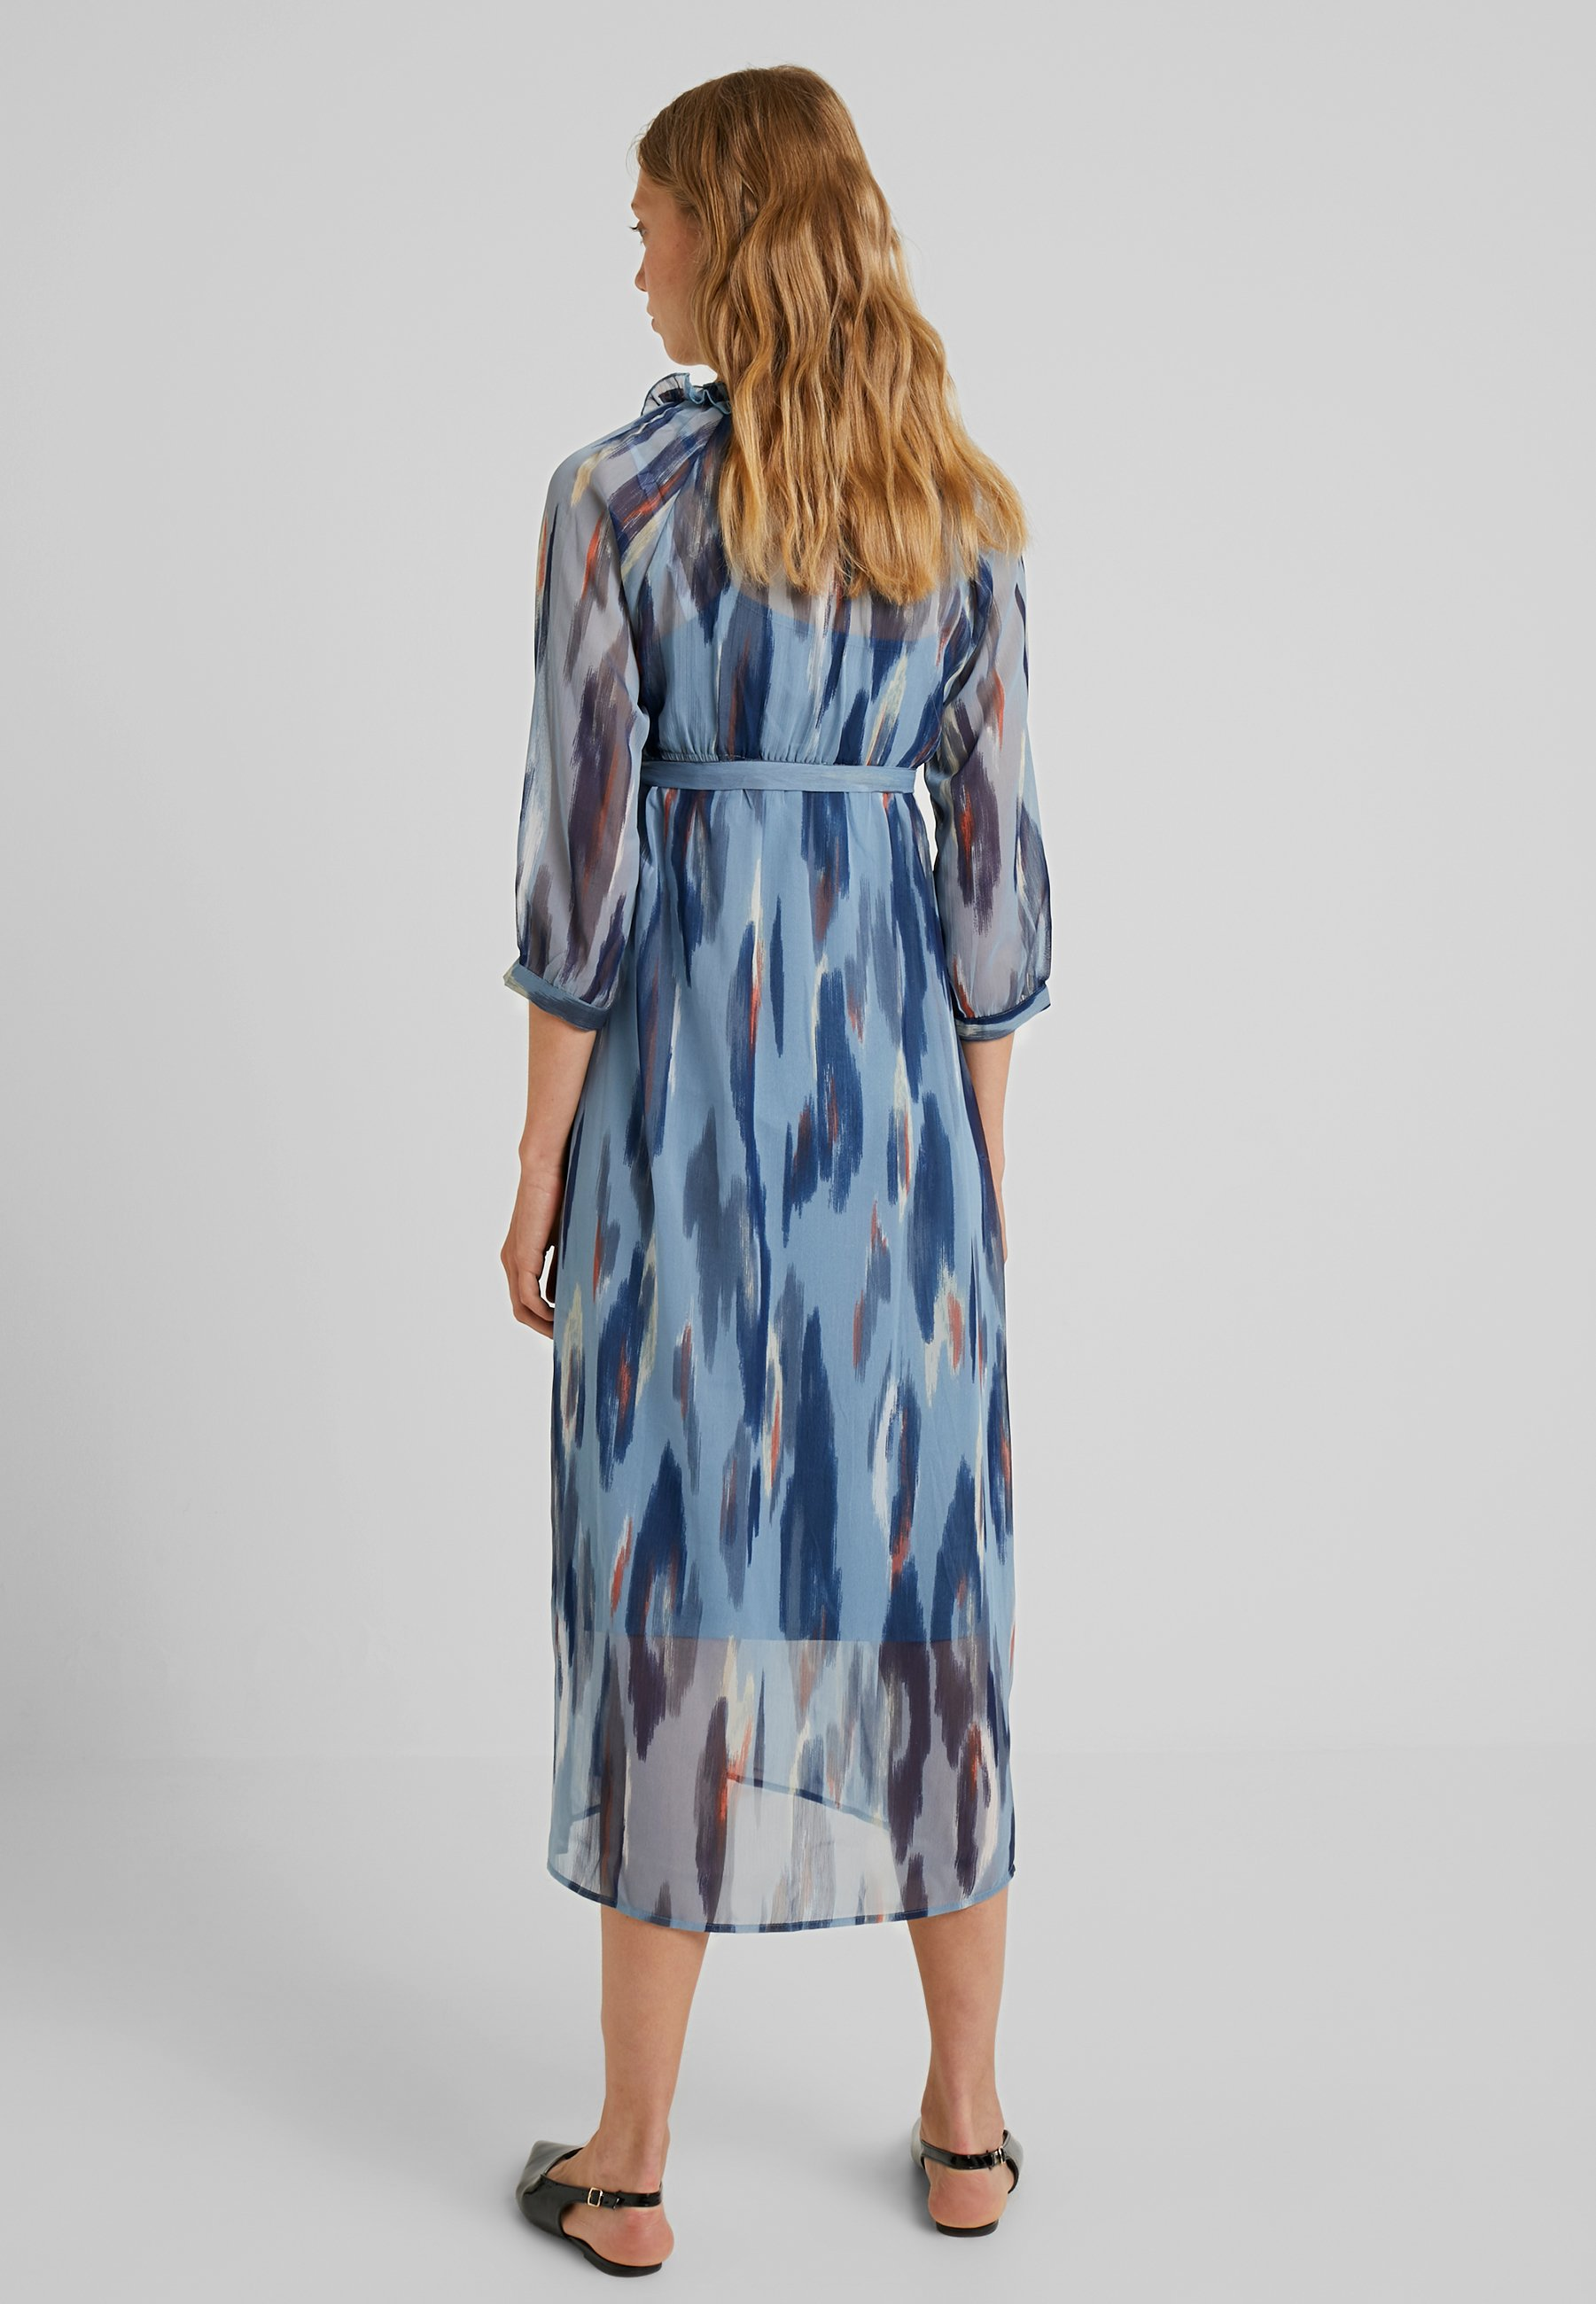 Carola Blue 4 Longue Aegean DressRobe Mamalicious 3 DEHI29